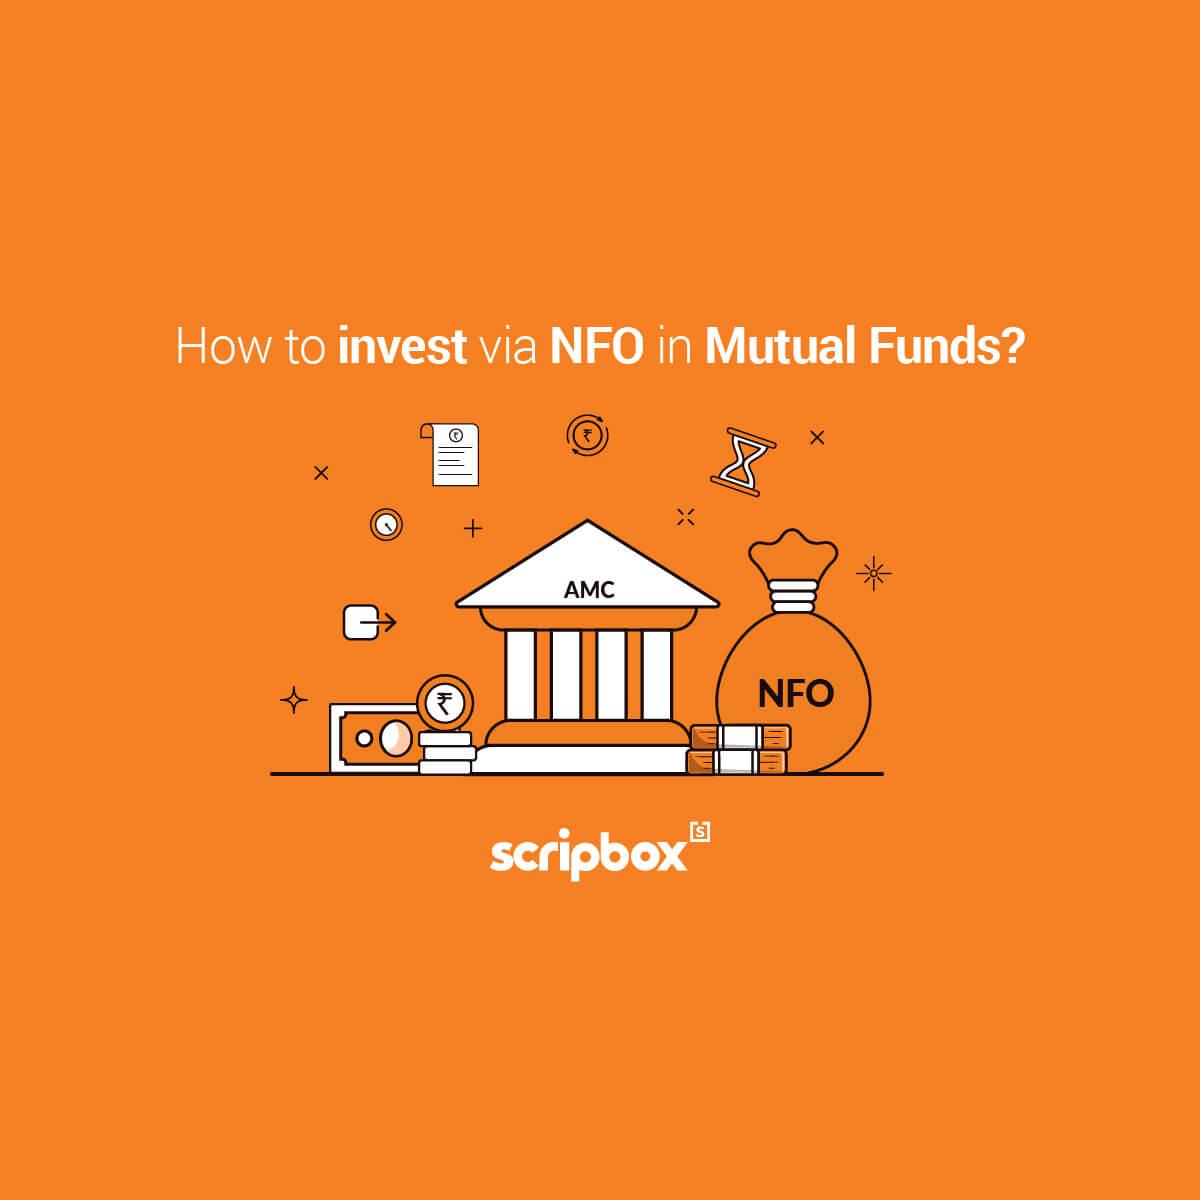 nfo mutual fund